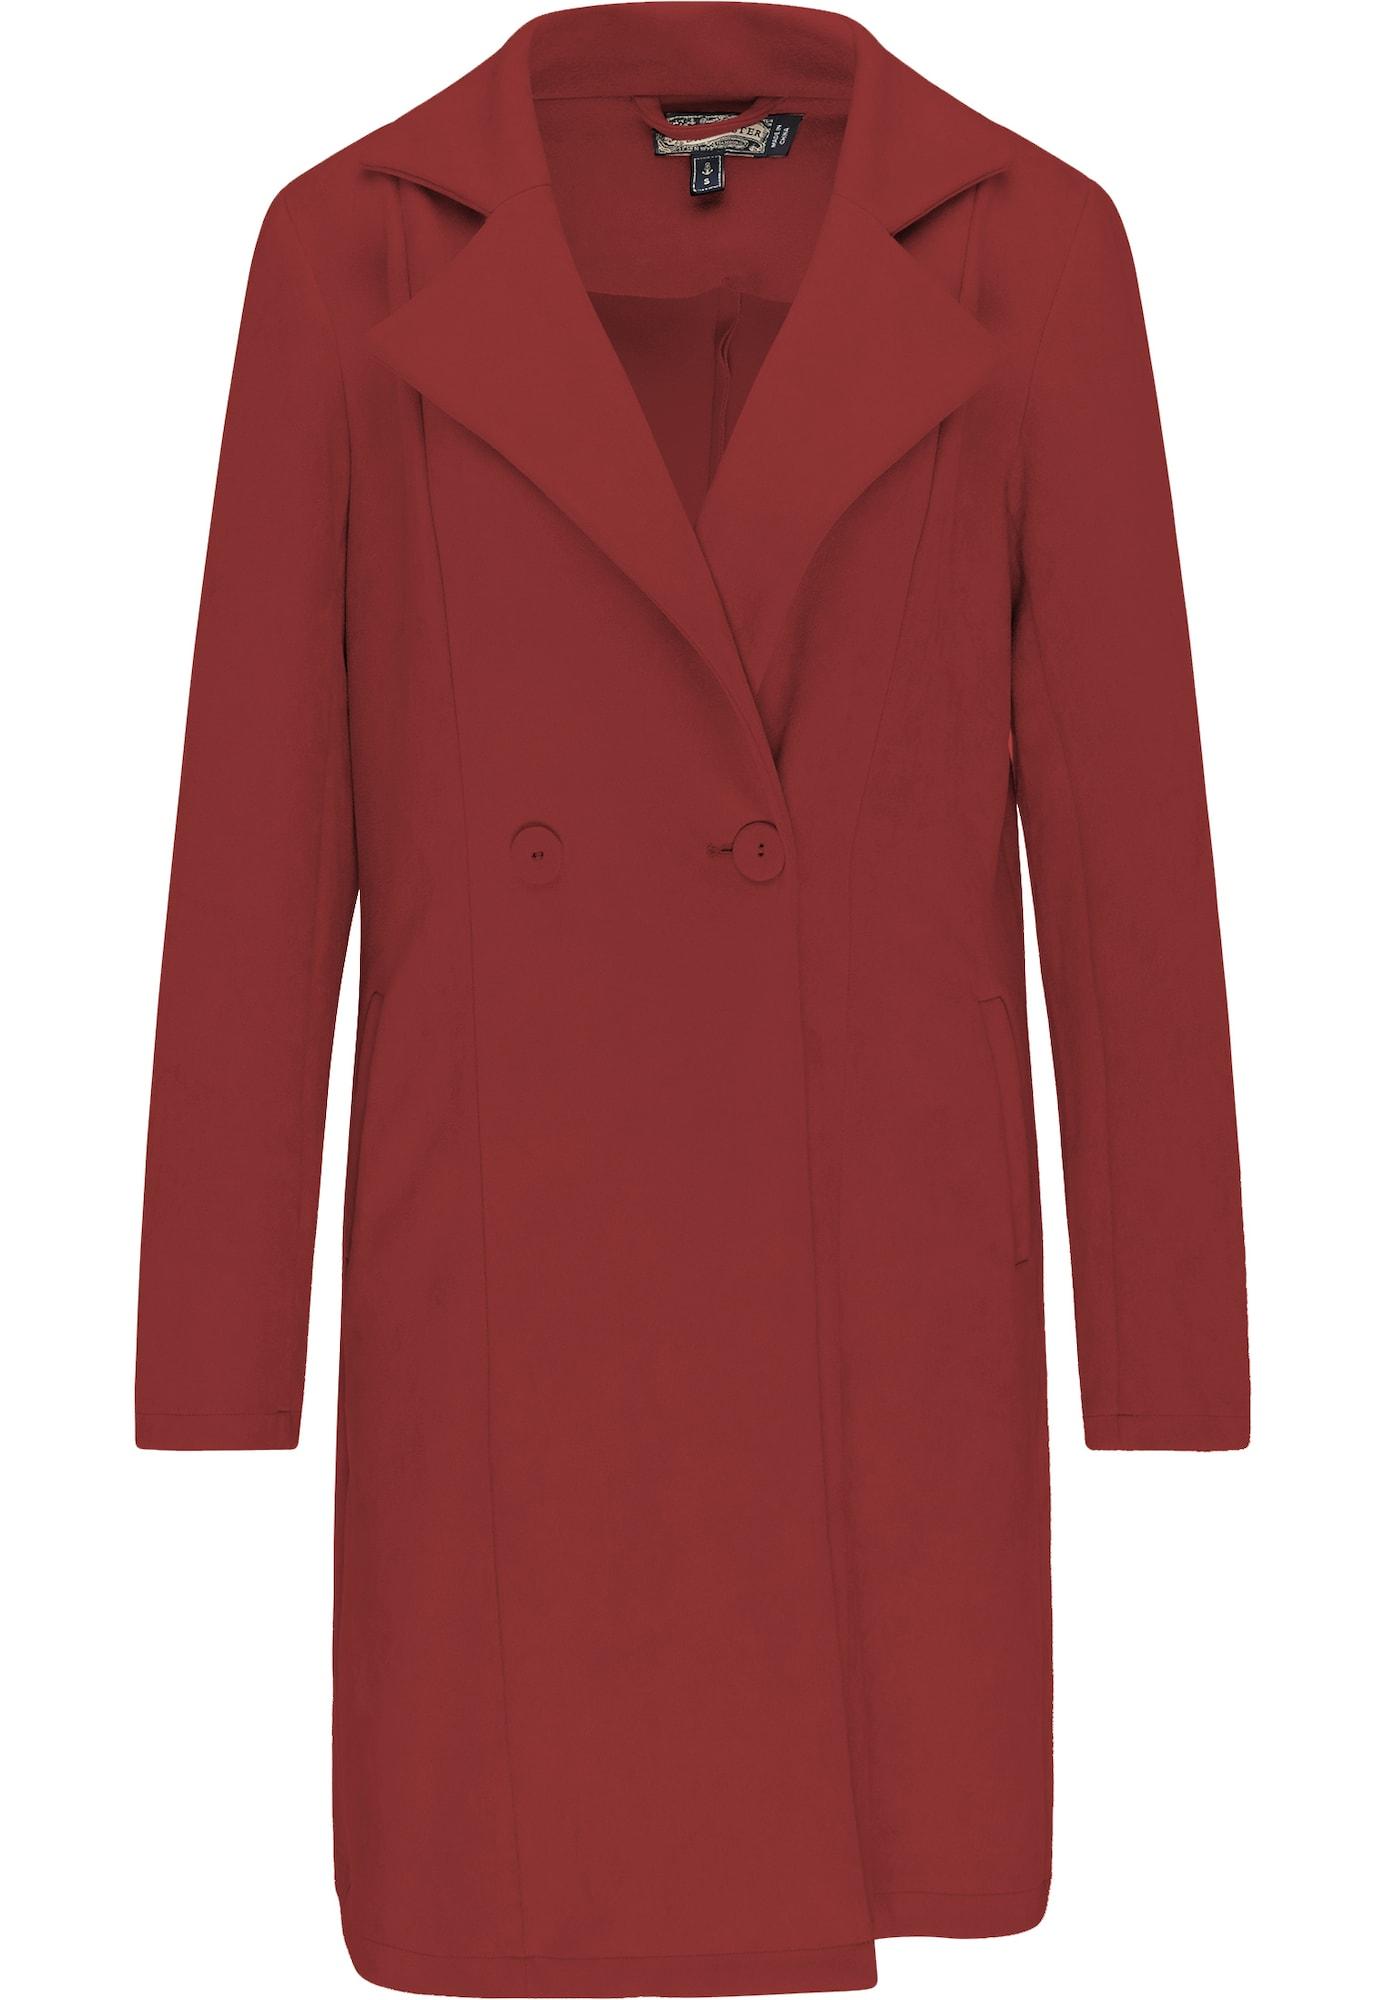 DreiMaster Vintage Demisezoninis paltas tamsiai raudona